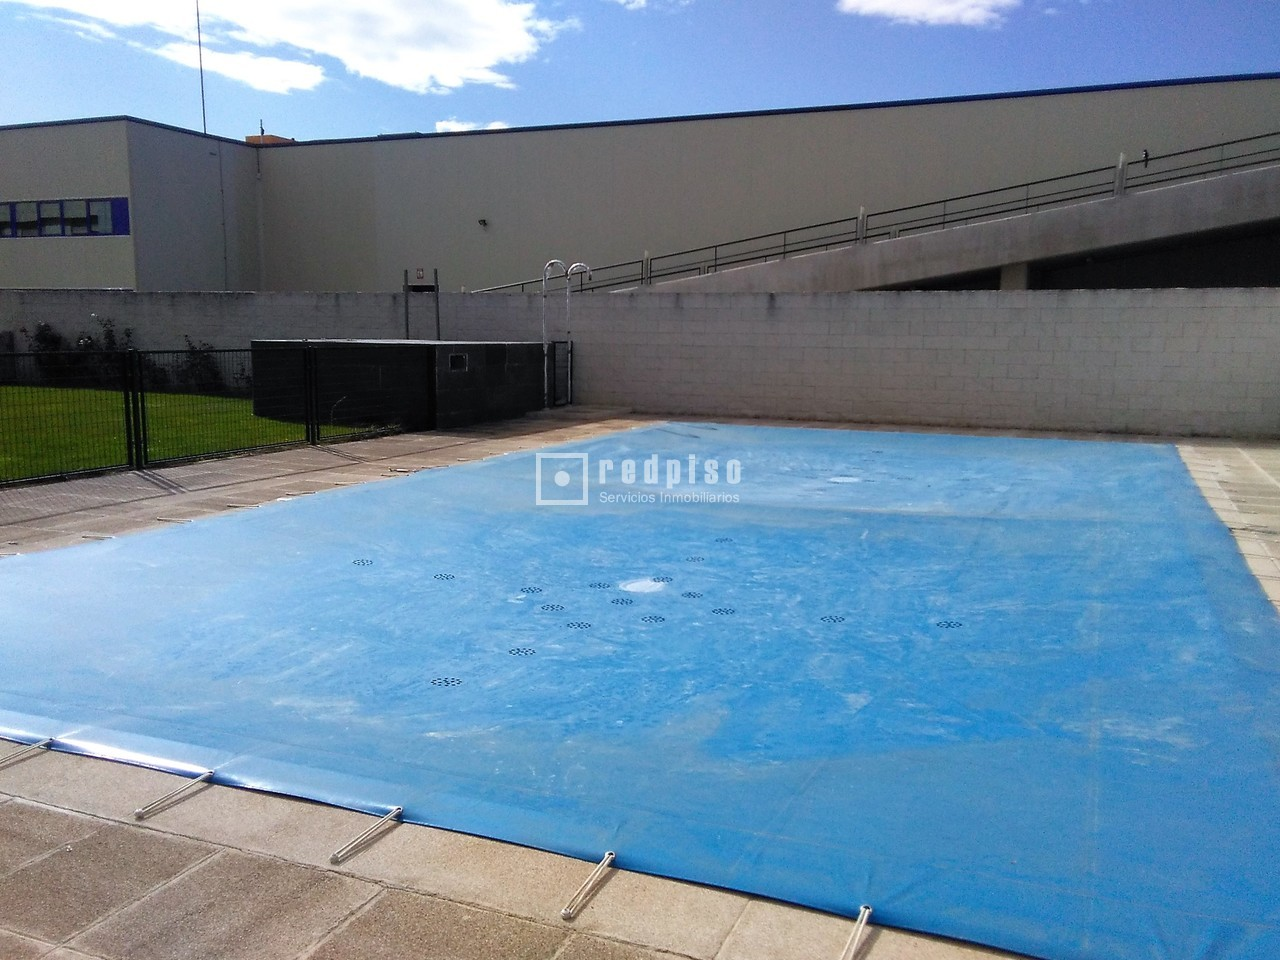 Piscinas tres cantos amazing deporte online with piscinas for Piscina tres cantos